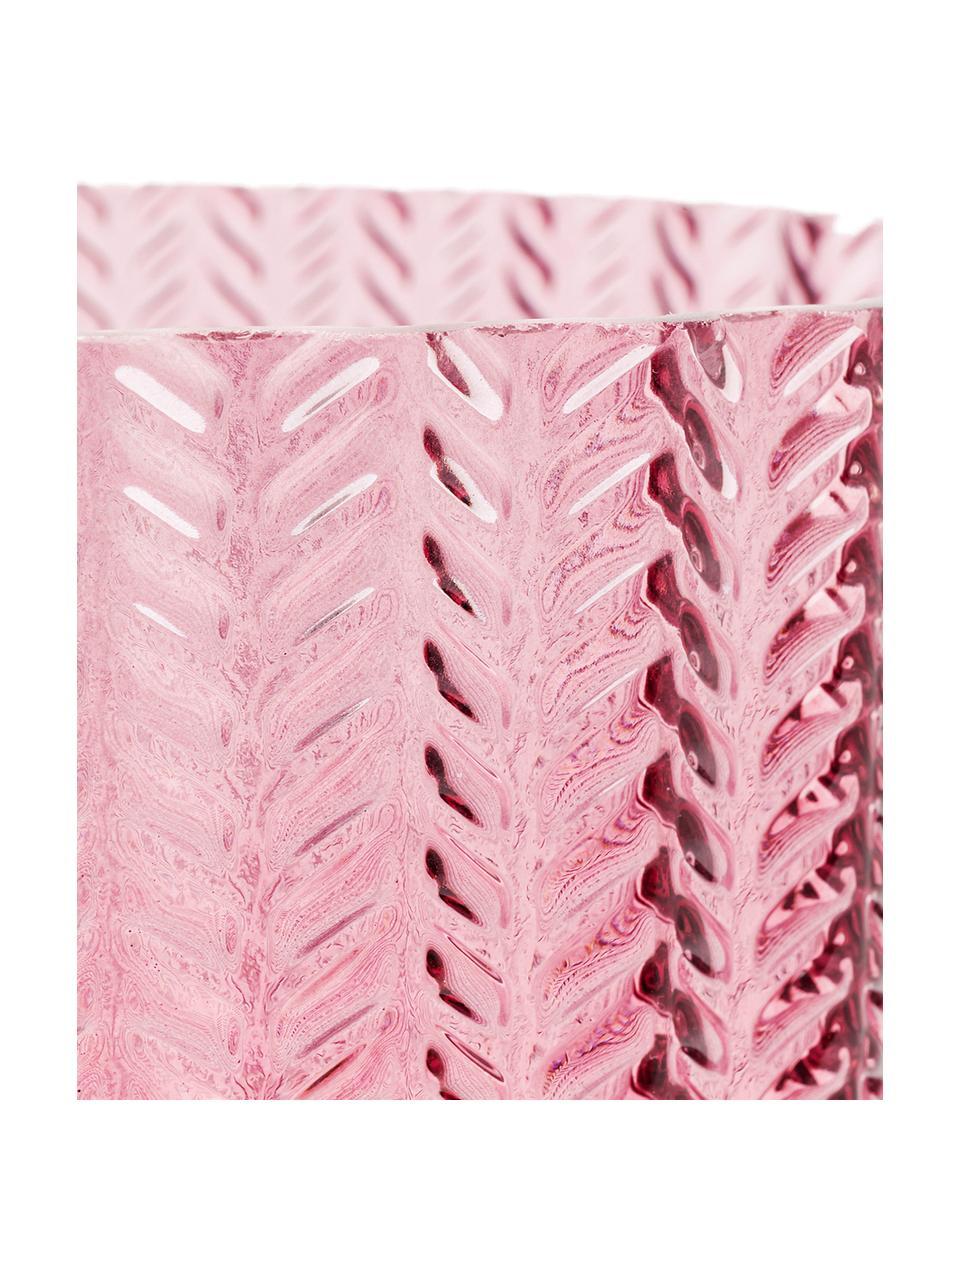 Glas-Vase Barfly mit Messingsockel, Vase: Glas gefärbt, Sockel: Messing, gebürstet, Rosa, transparent, Ø 17 x H 24 cm